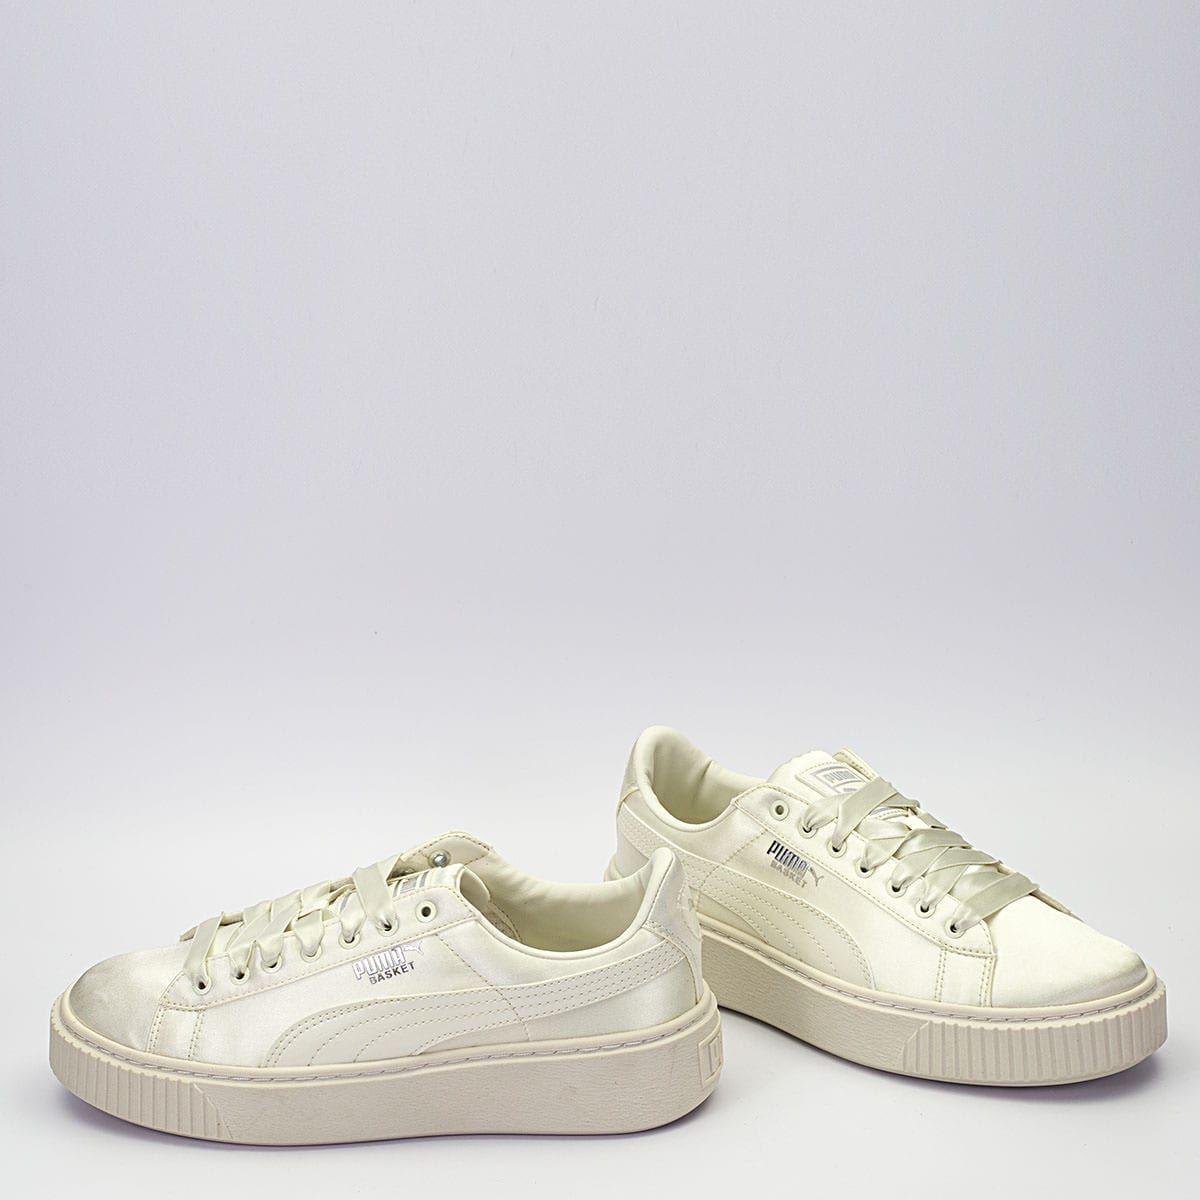 best sneakers 23ed6 ecceb Puma Basket Platform Tween JR λευκό, με satin υλικό, satin ...